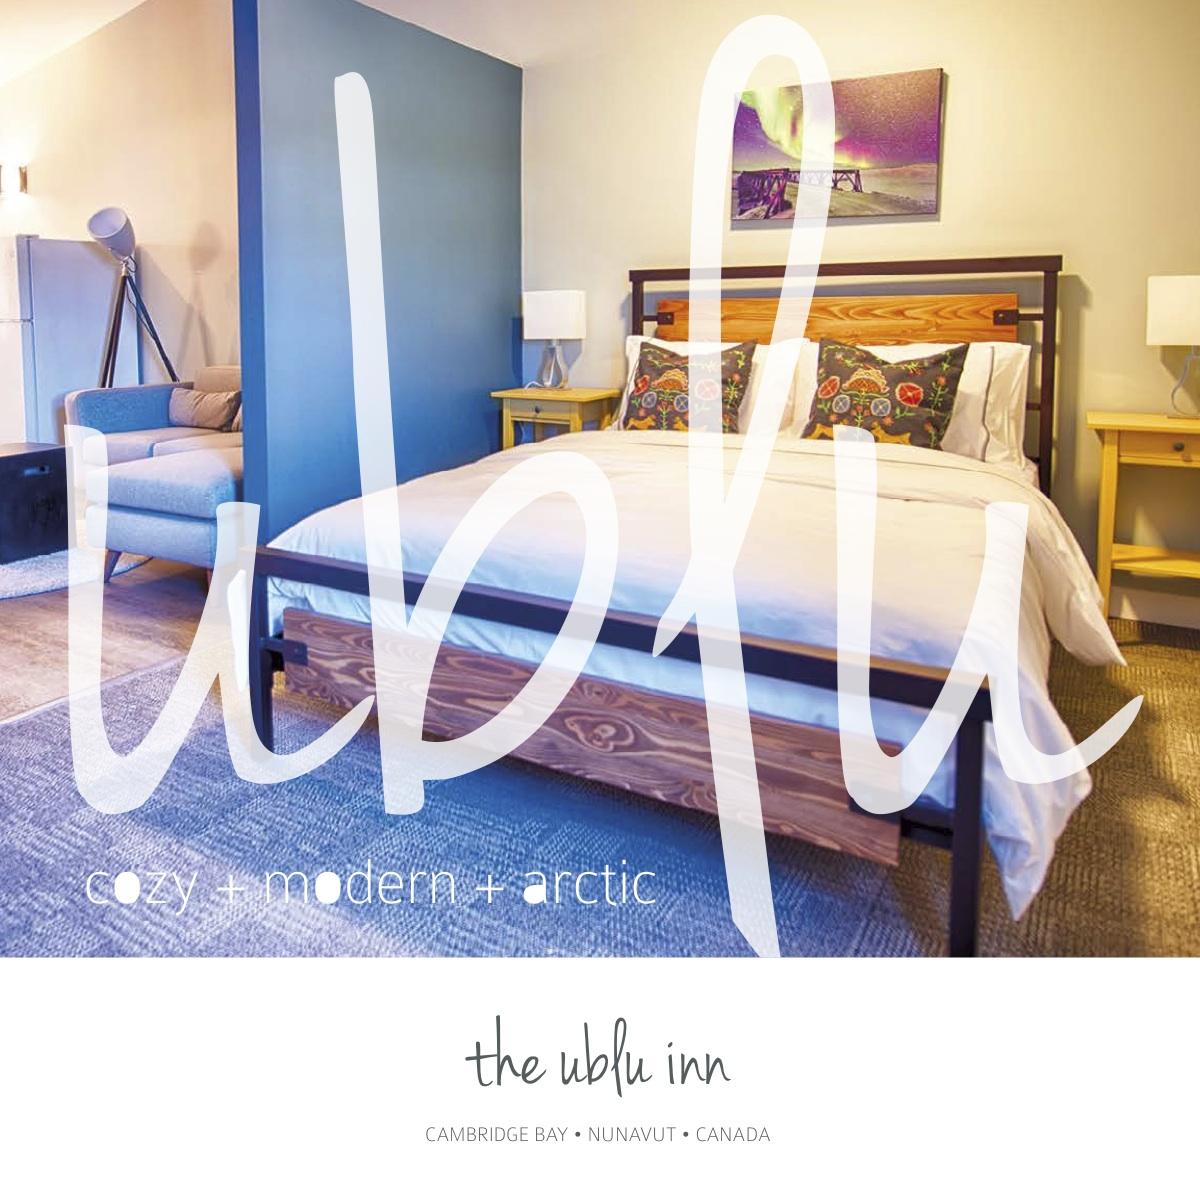 THE UBLU INN